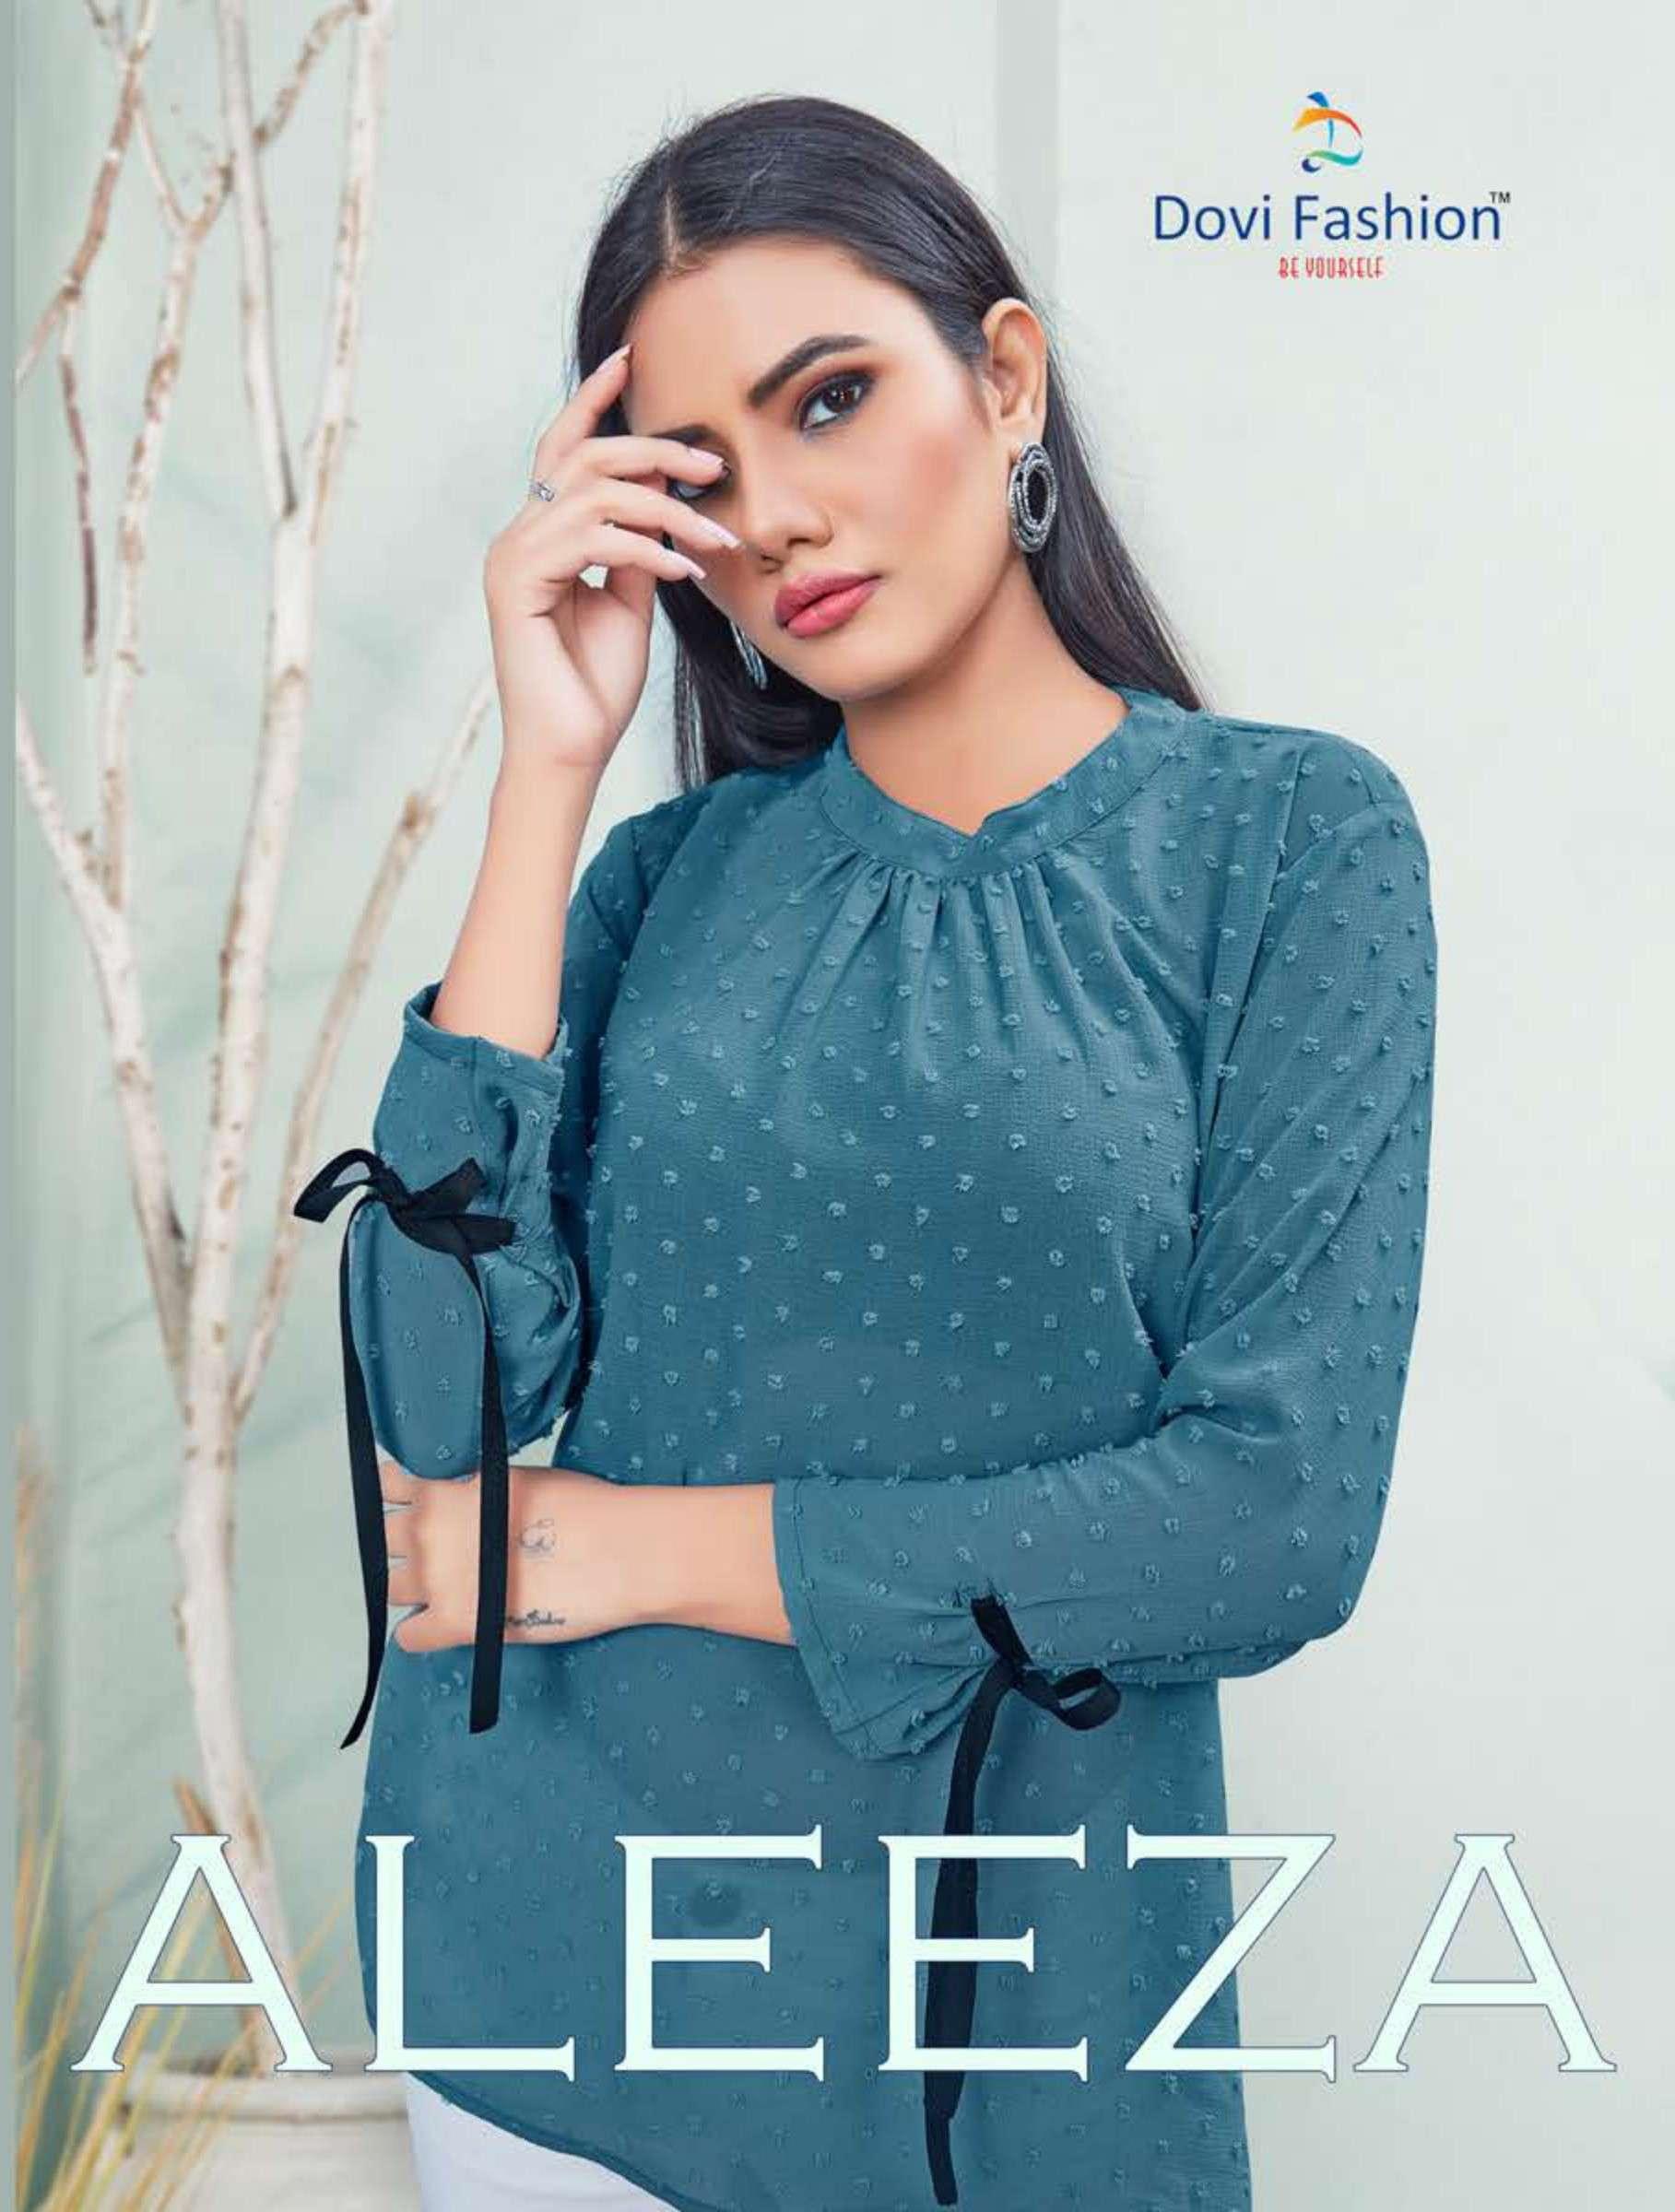 DOVI FASHION-ALEEZA